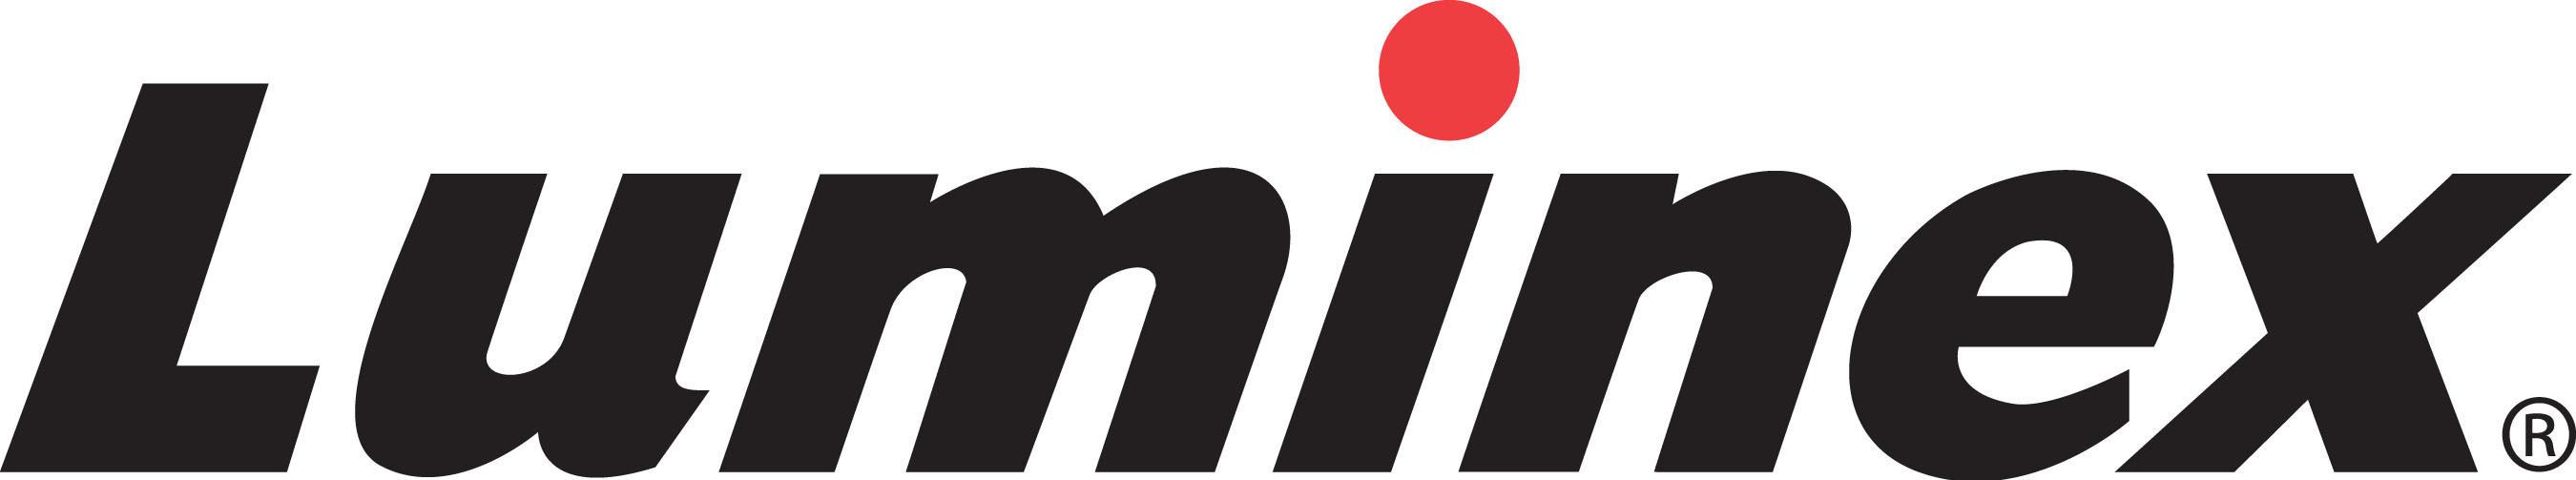 Luminex logo.